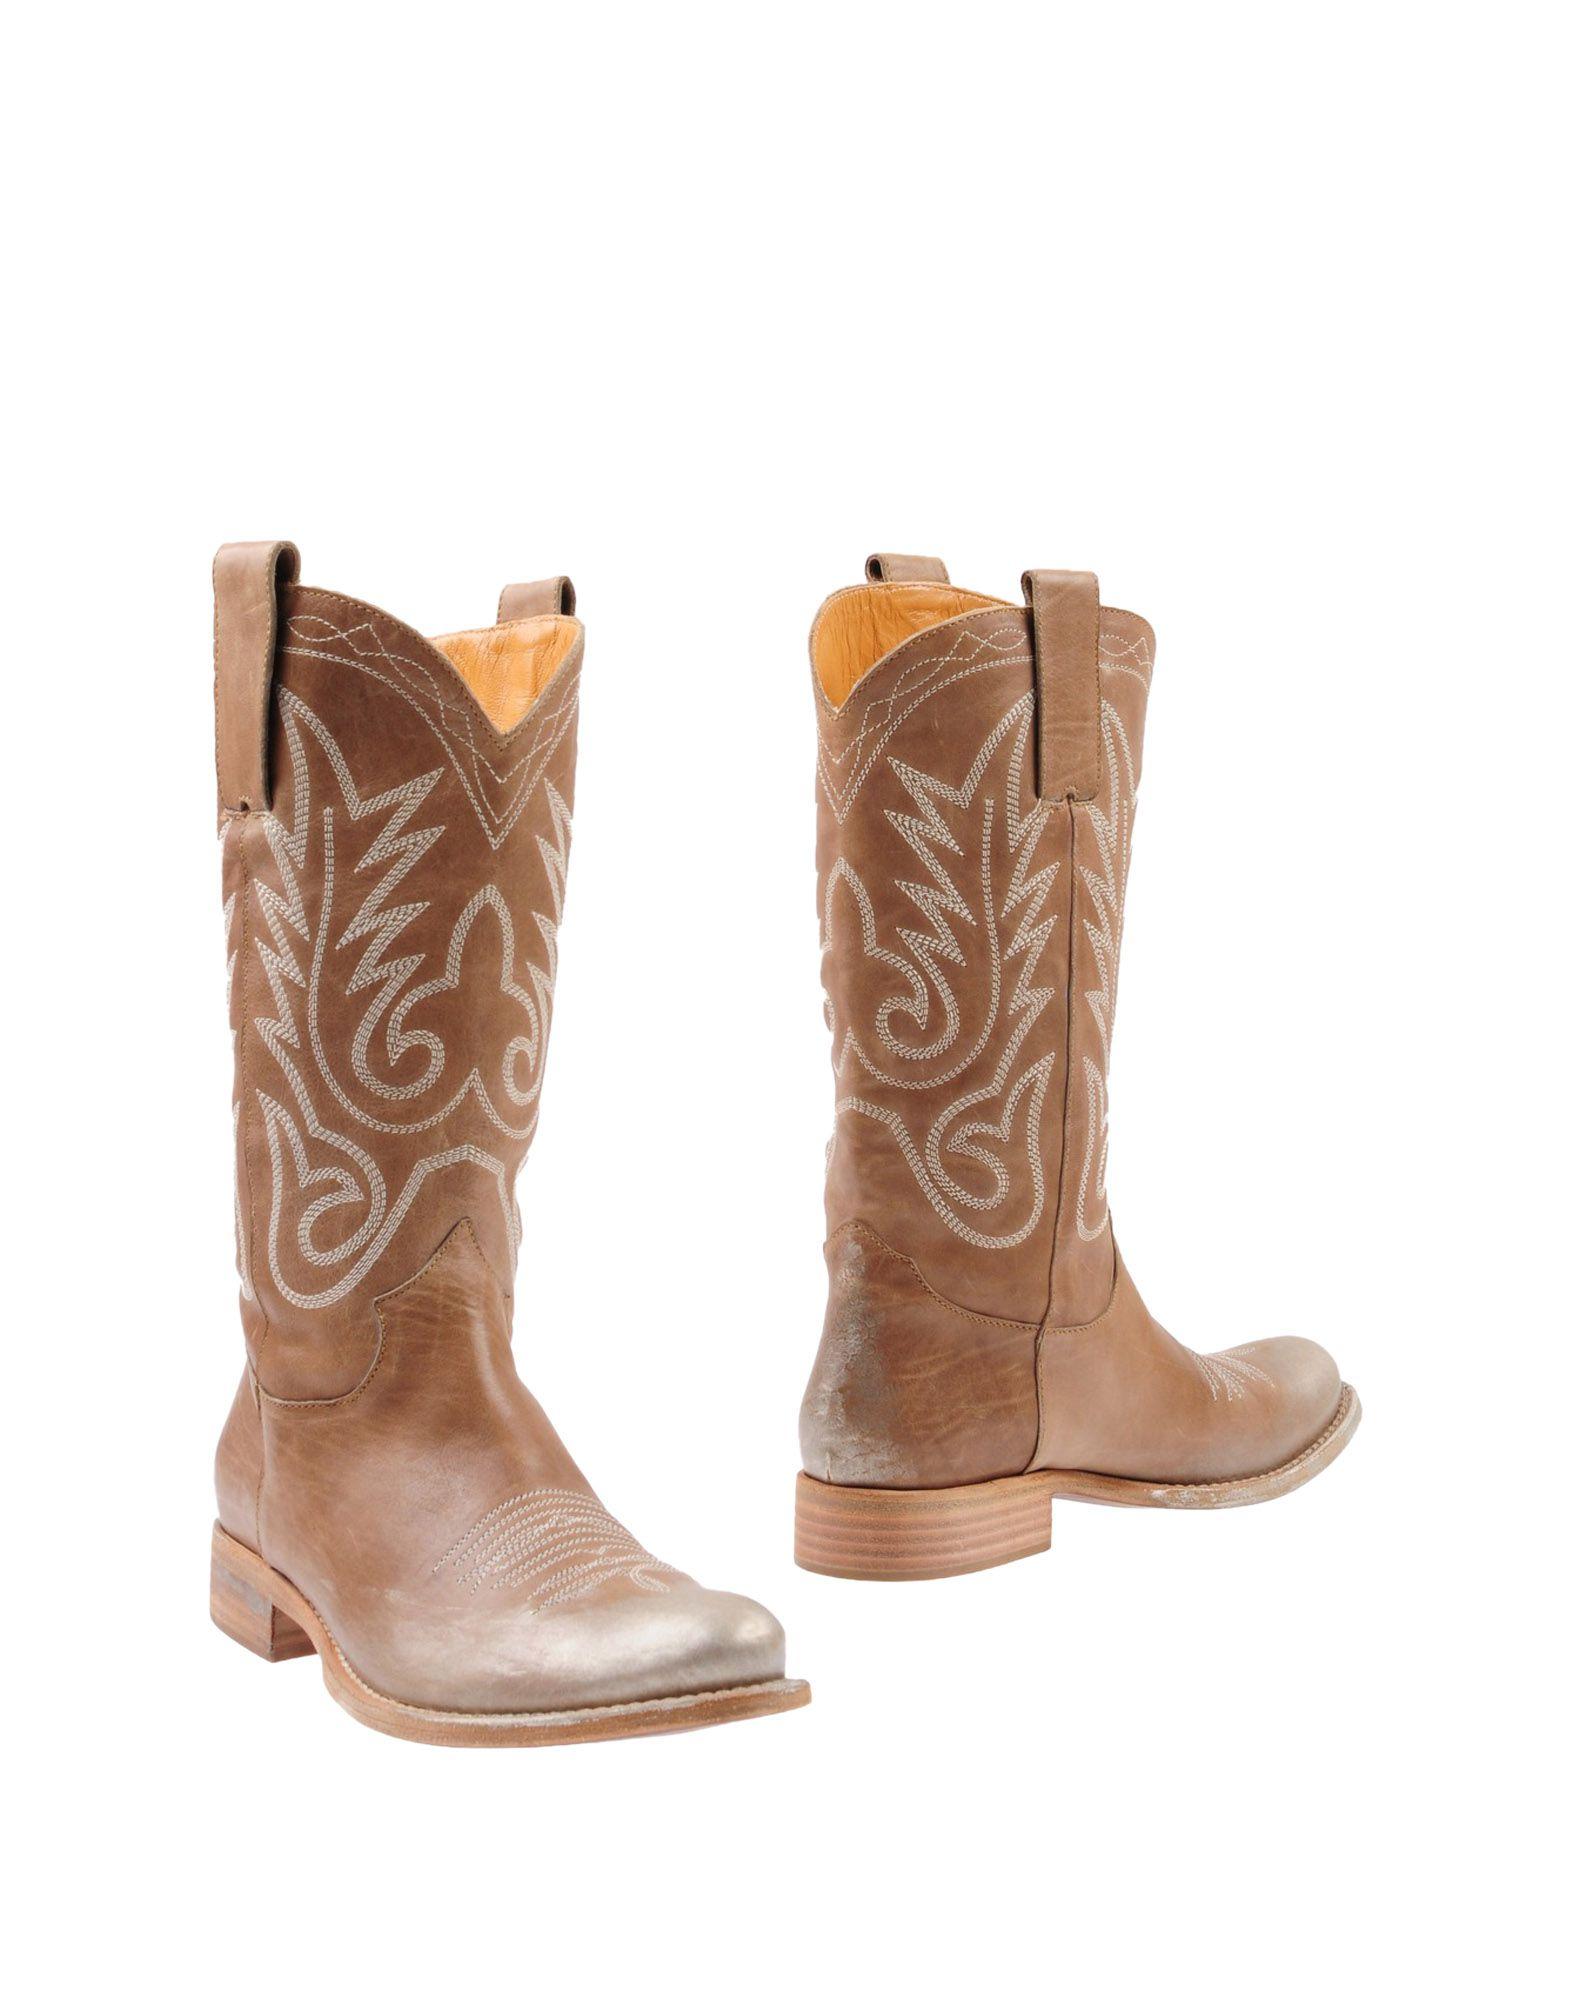 Lena Milos Stiefel Damen  11436669FD Gute Qualität beliebte Schuhe